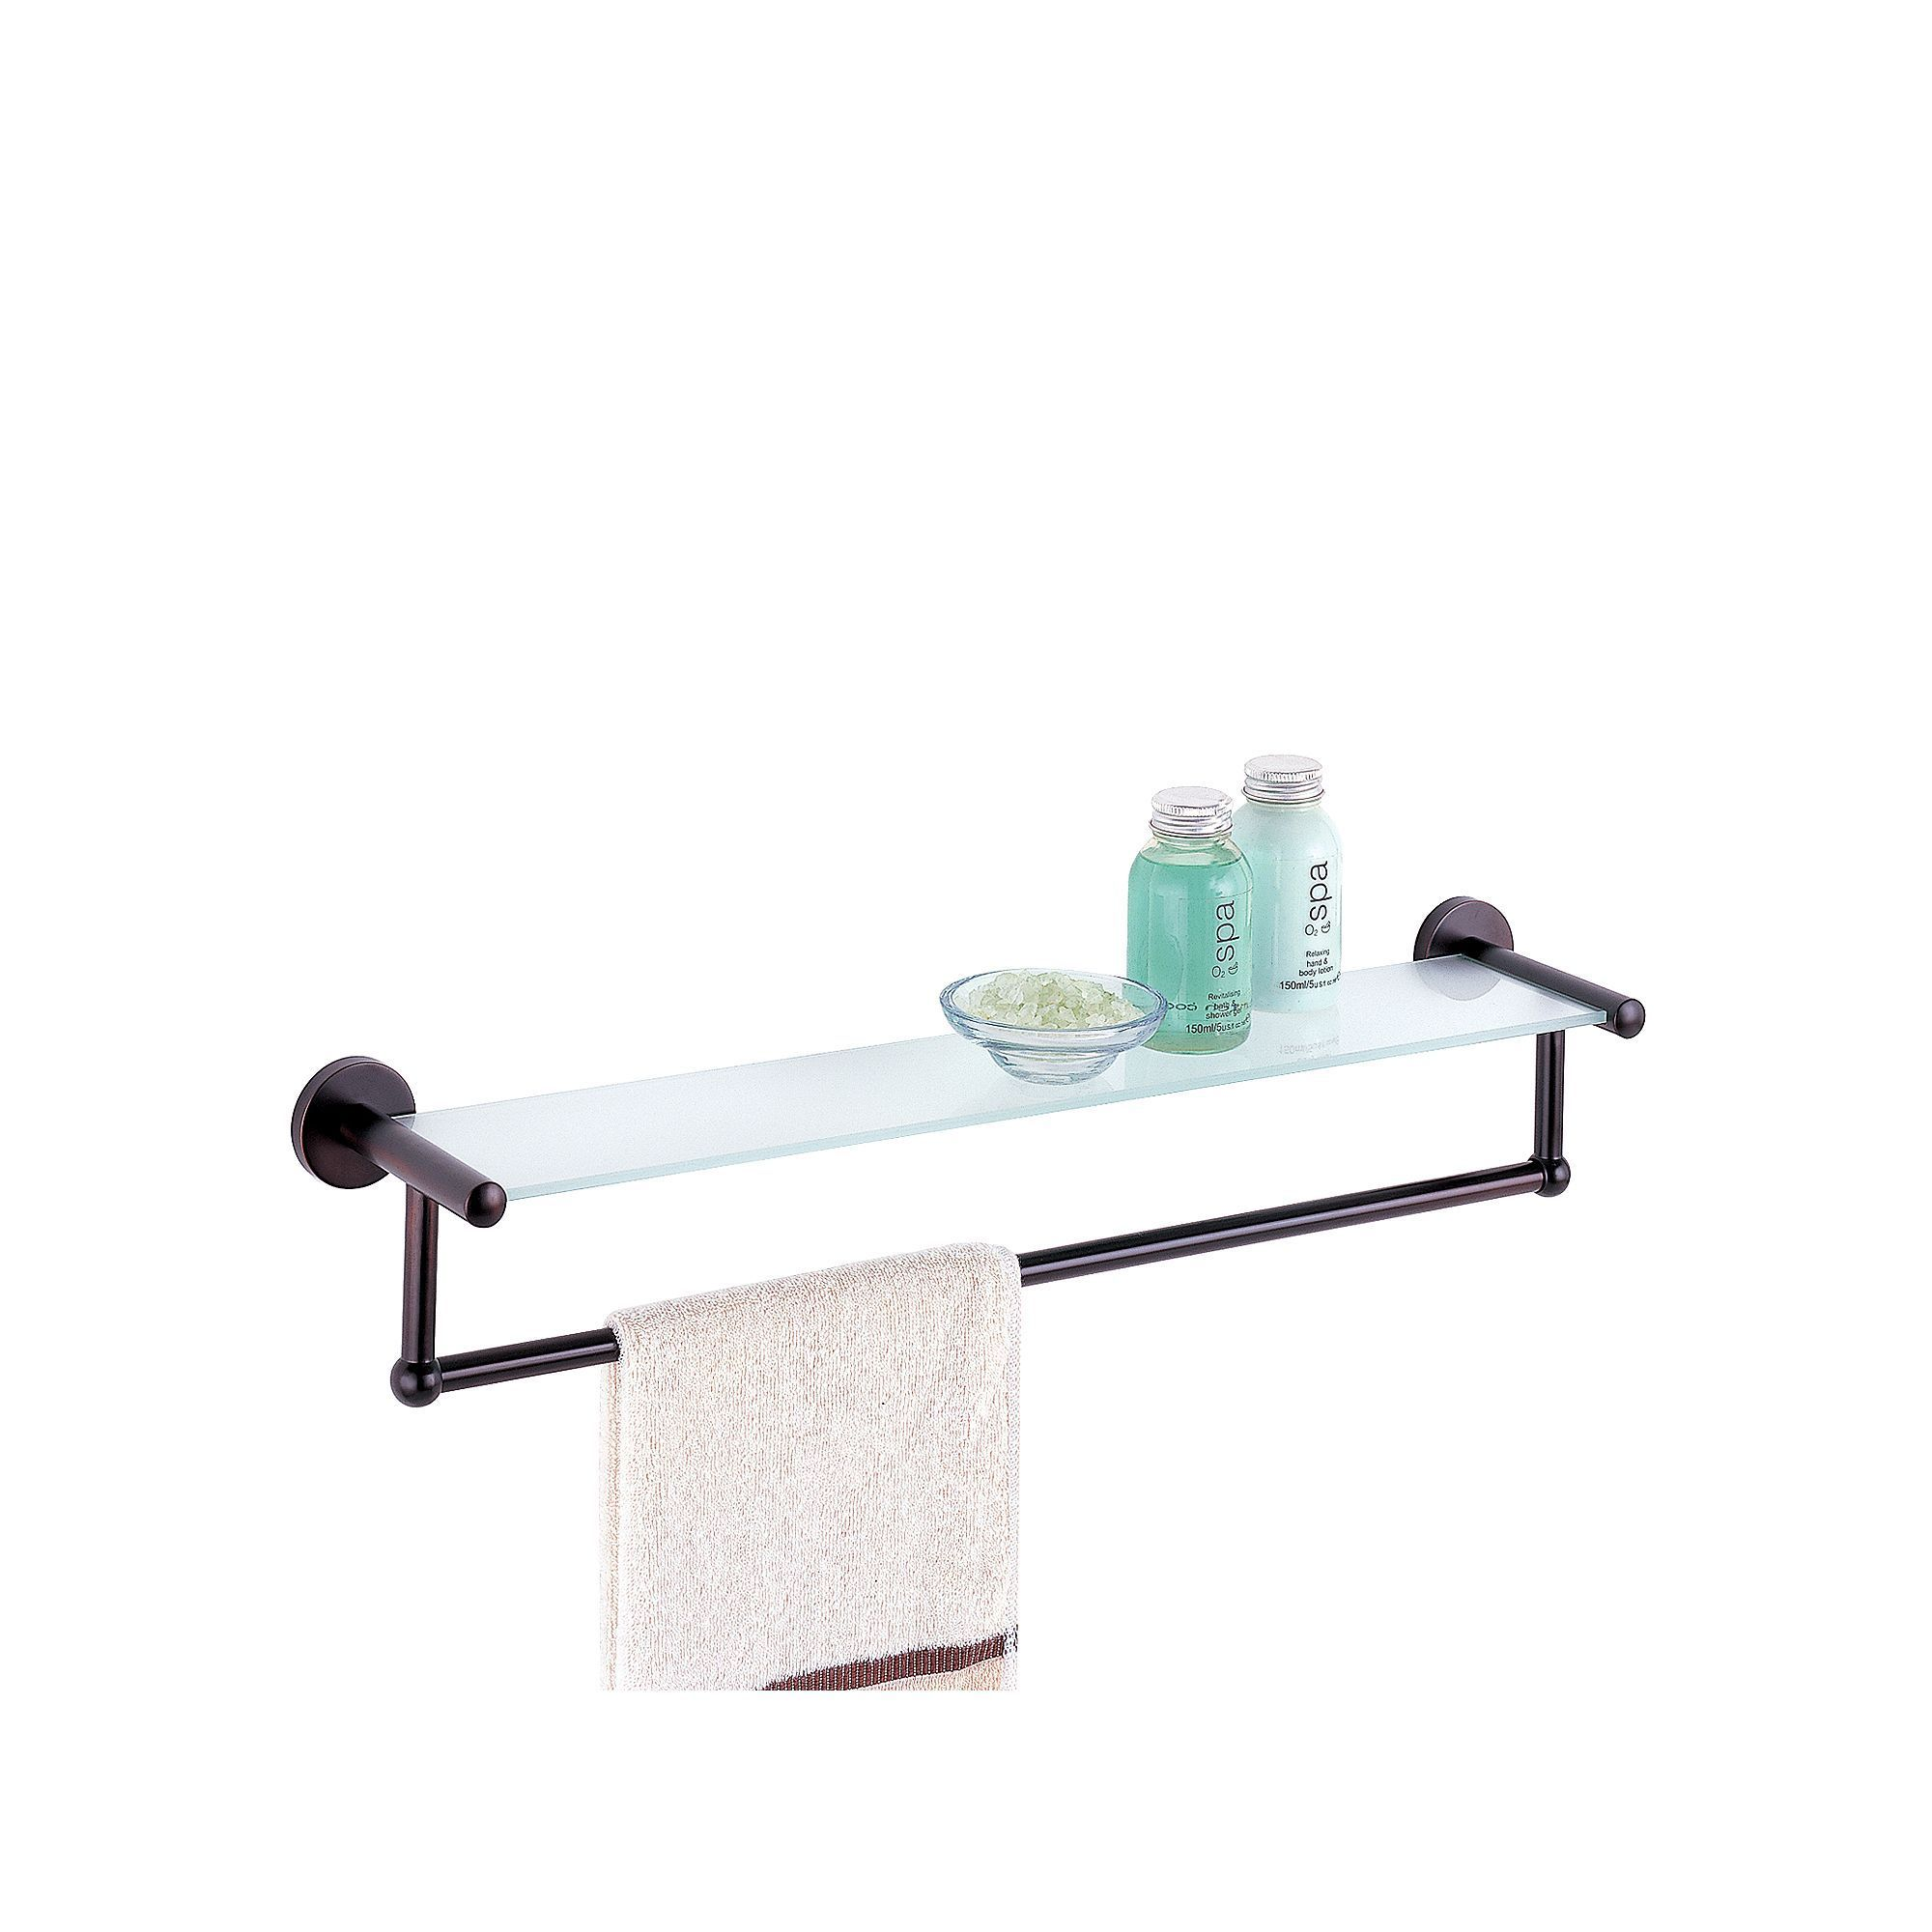 Neu Home Glass Shelf Towel Rack - Bronze | Glass shelves, Towels and ...